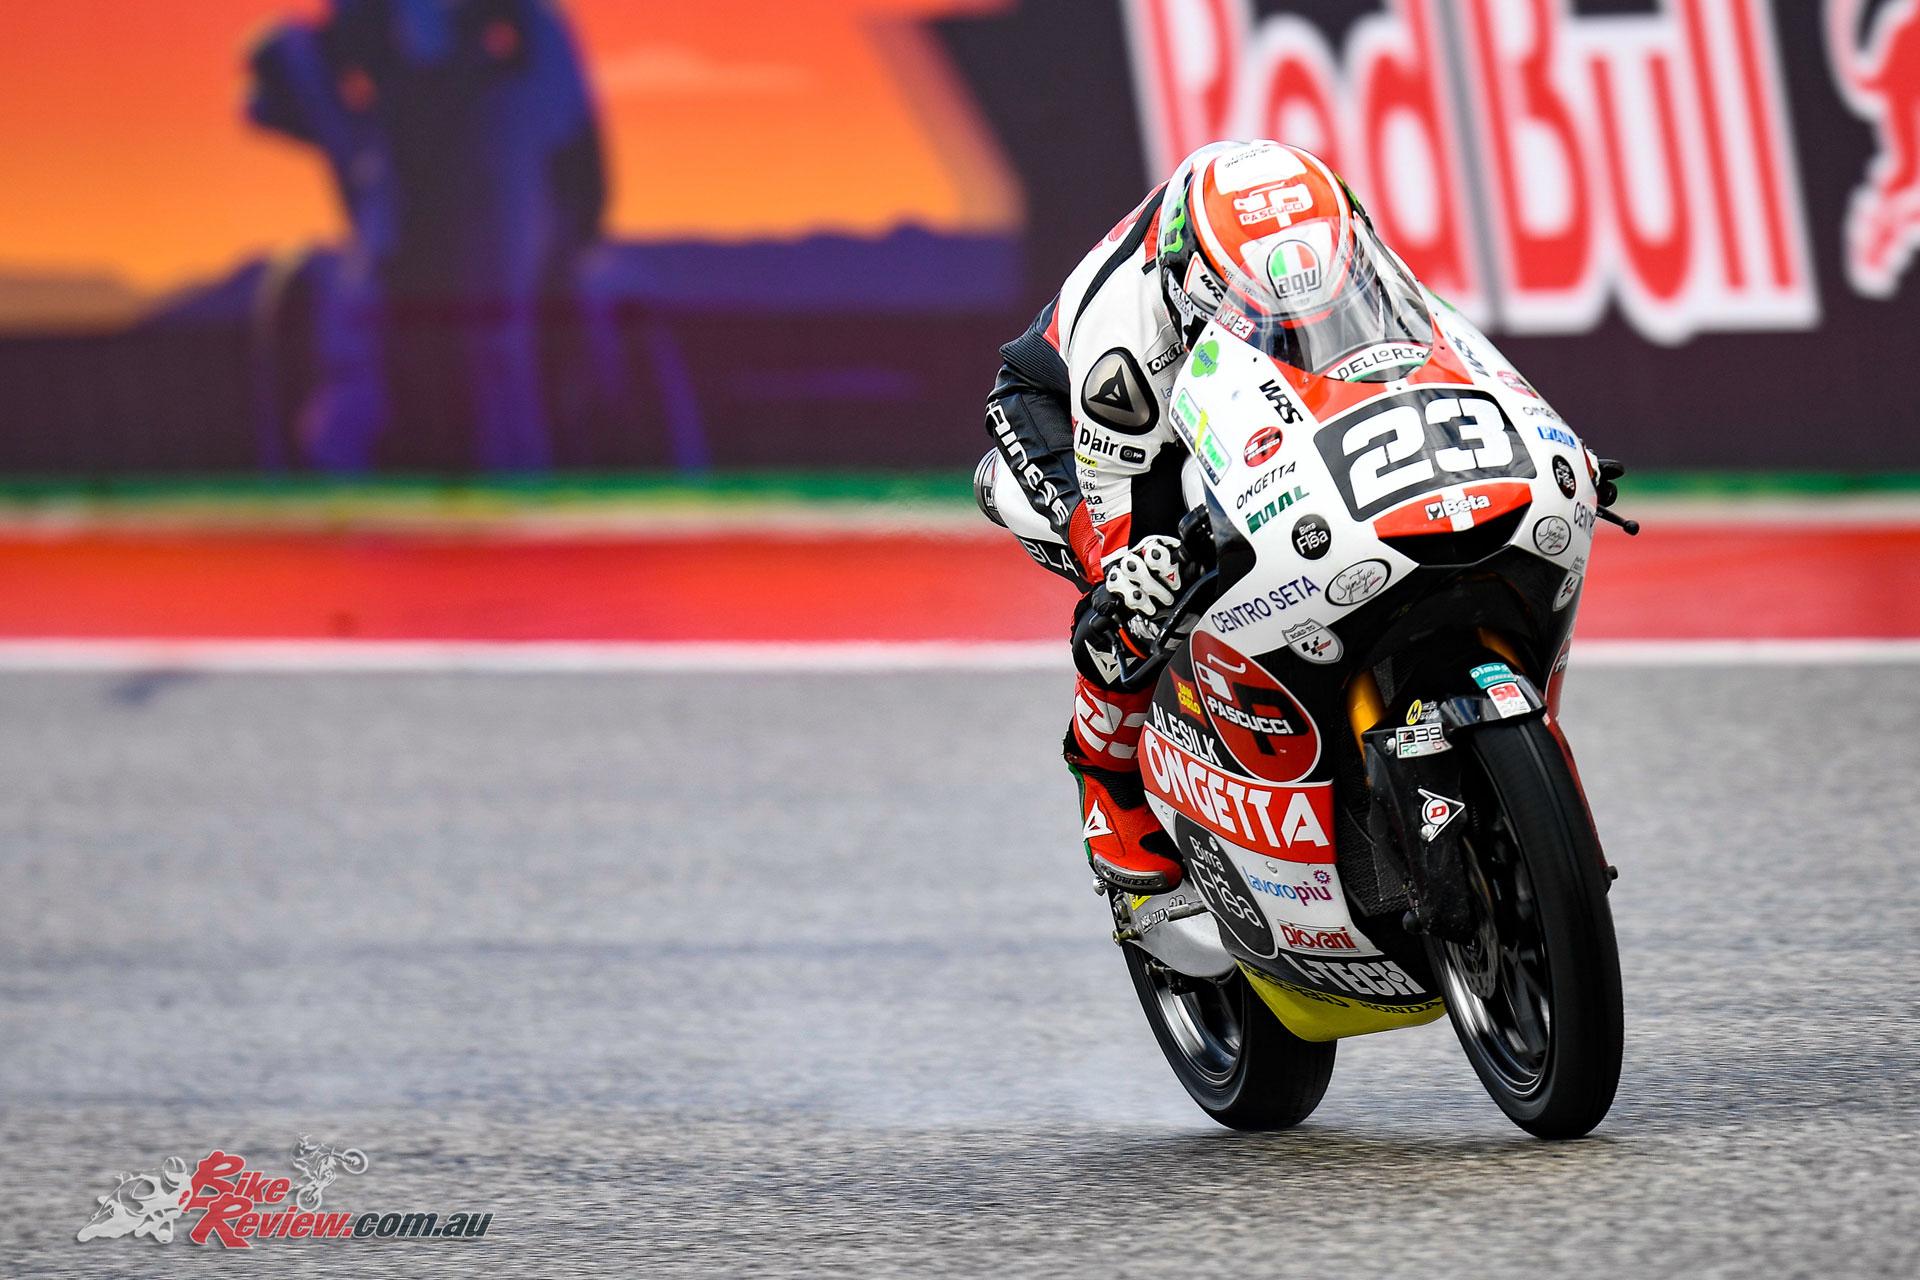 Niccolo Antonelli - 2019 Circuit of the Americas MotoGP